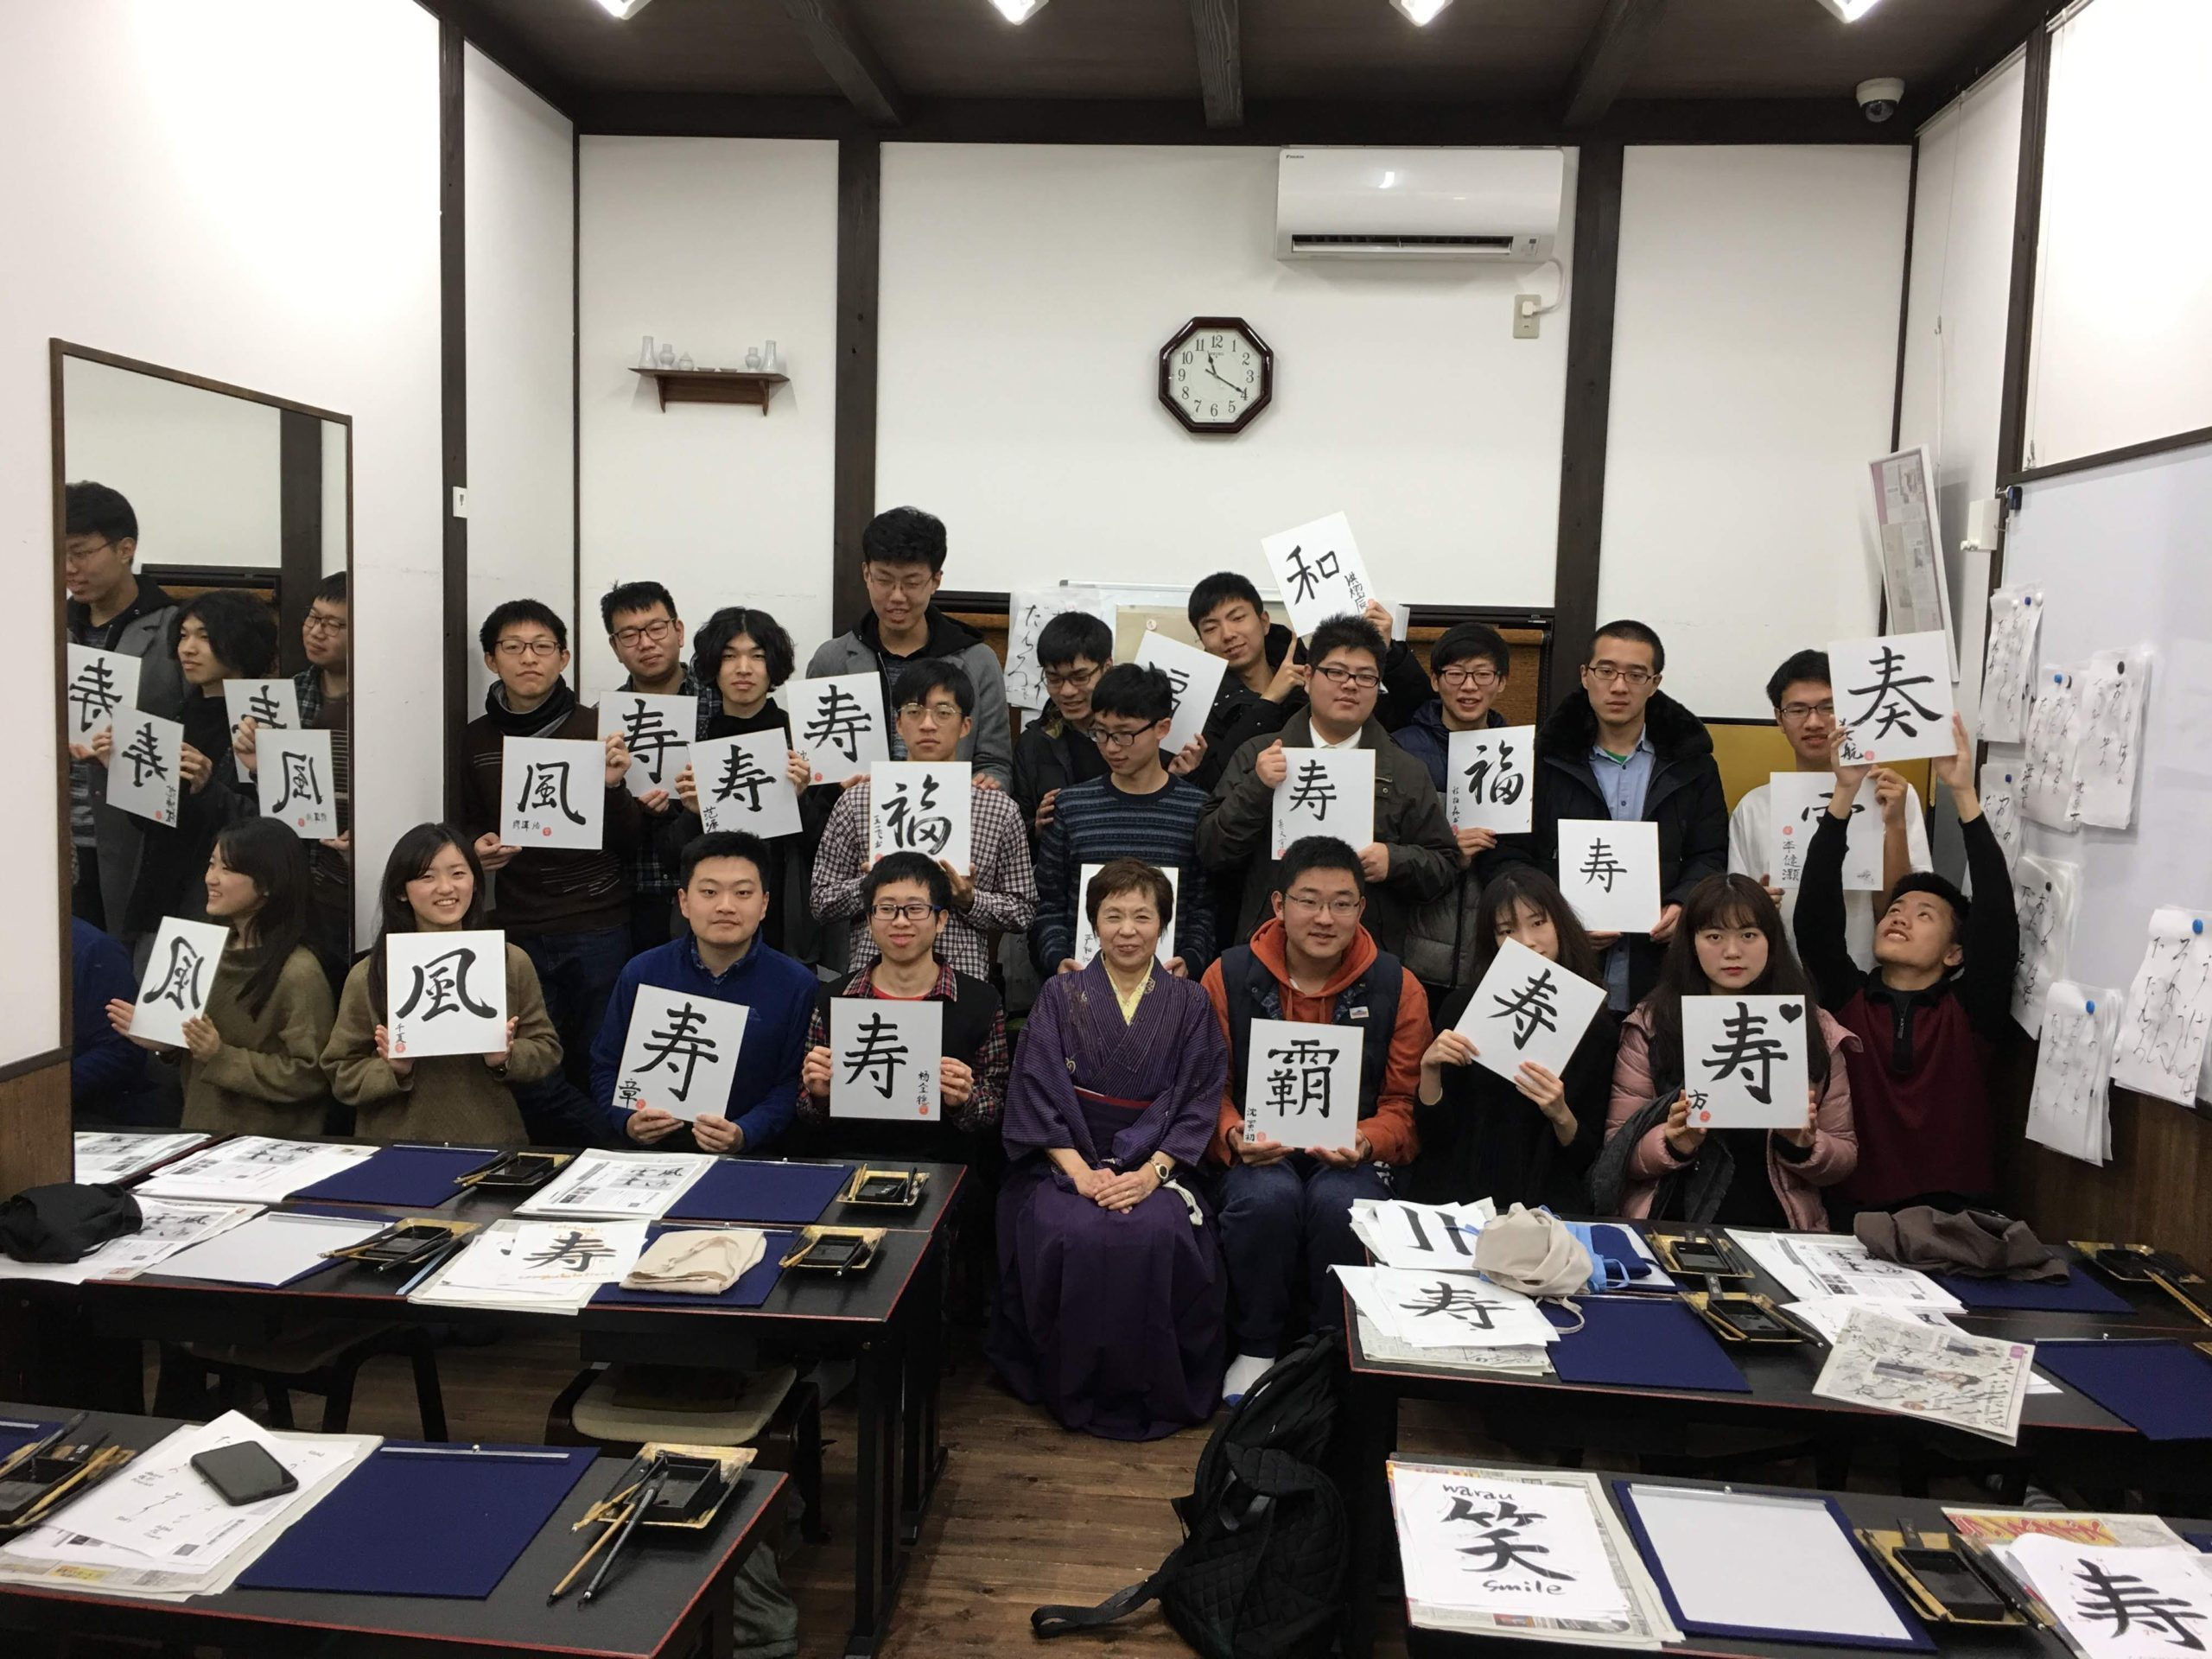 2022 Ritsumeikan Summer Japanese Program 1 (RSJP1)